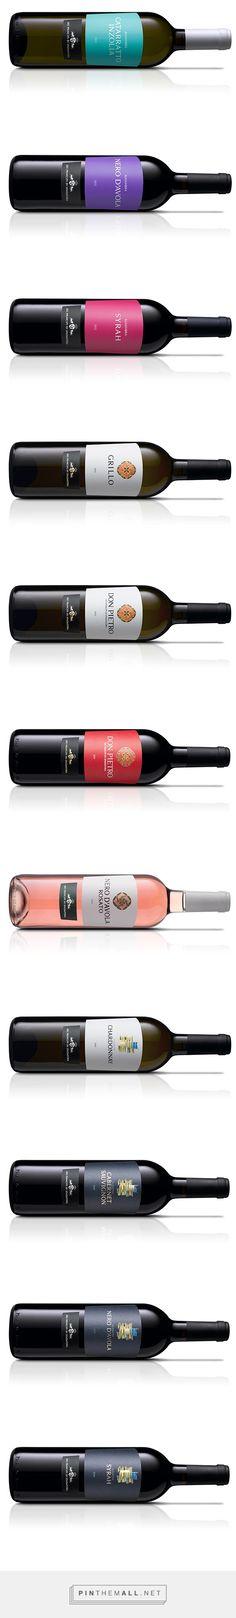 Spadafora wines_2014 upgrading - created via http://pinthemall.net